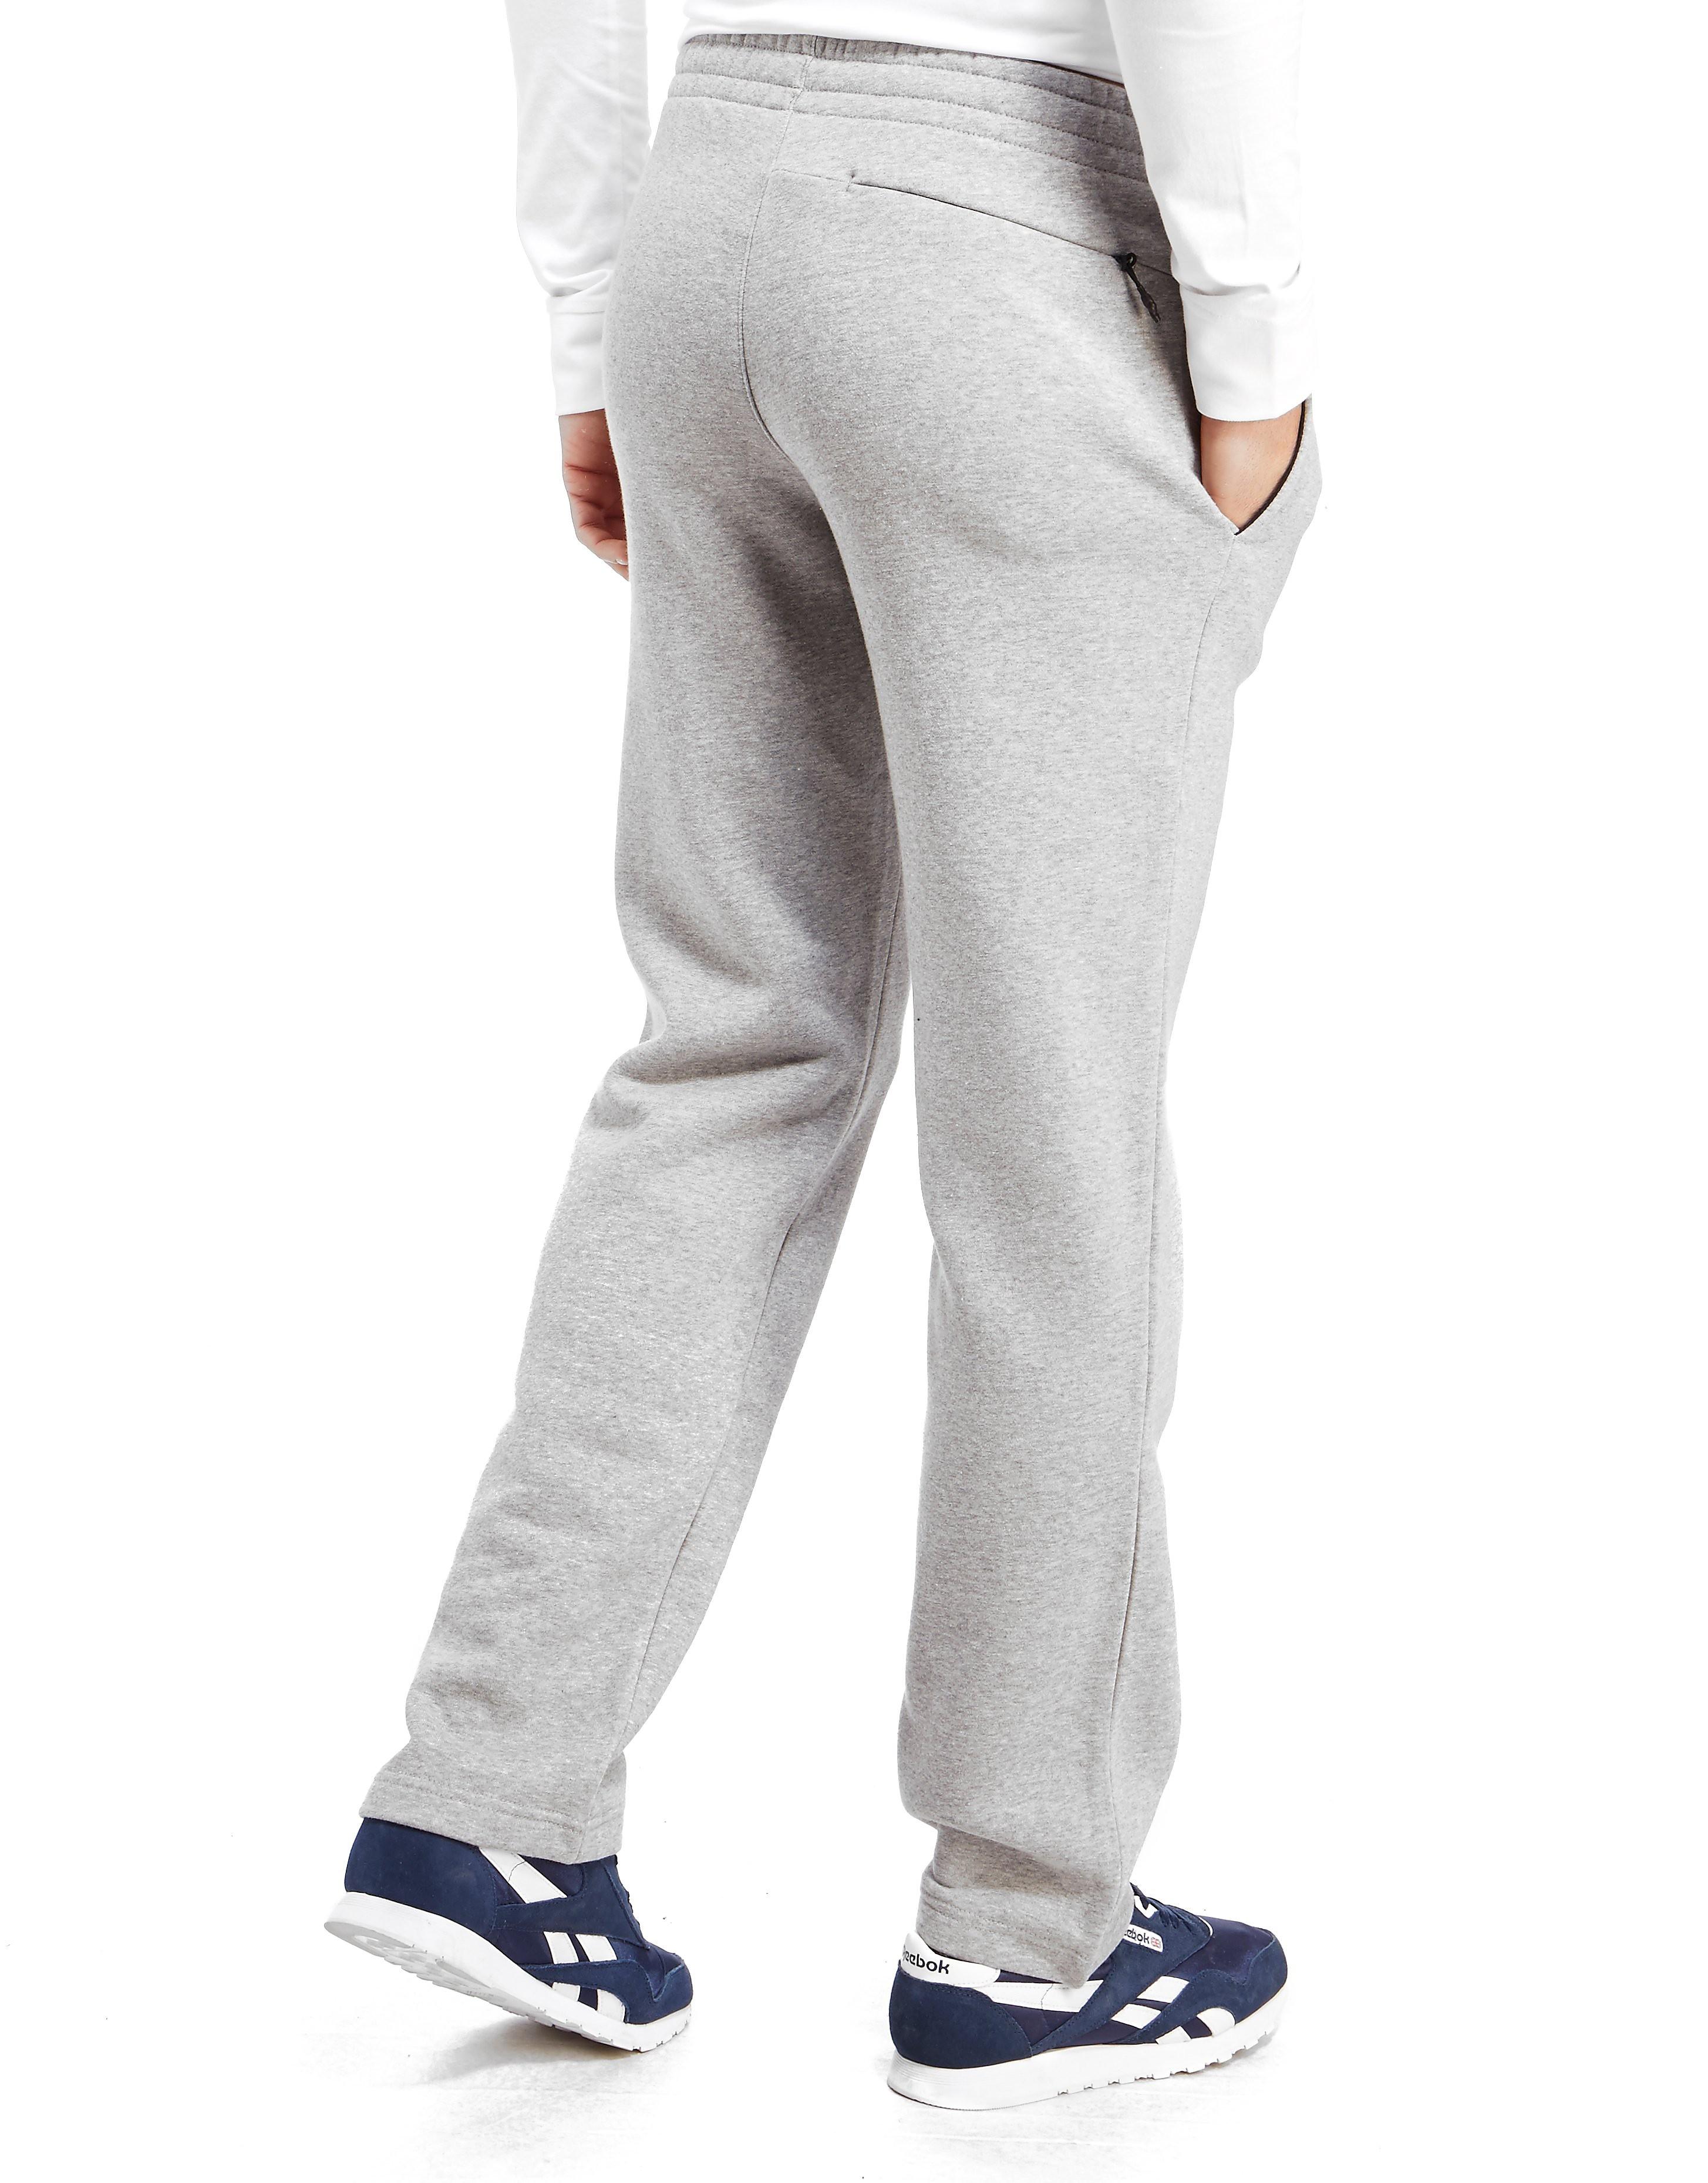 Reebok Classic Straight Leg Pants